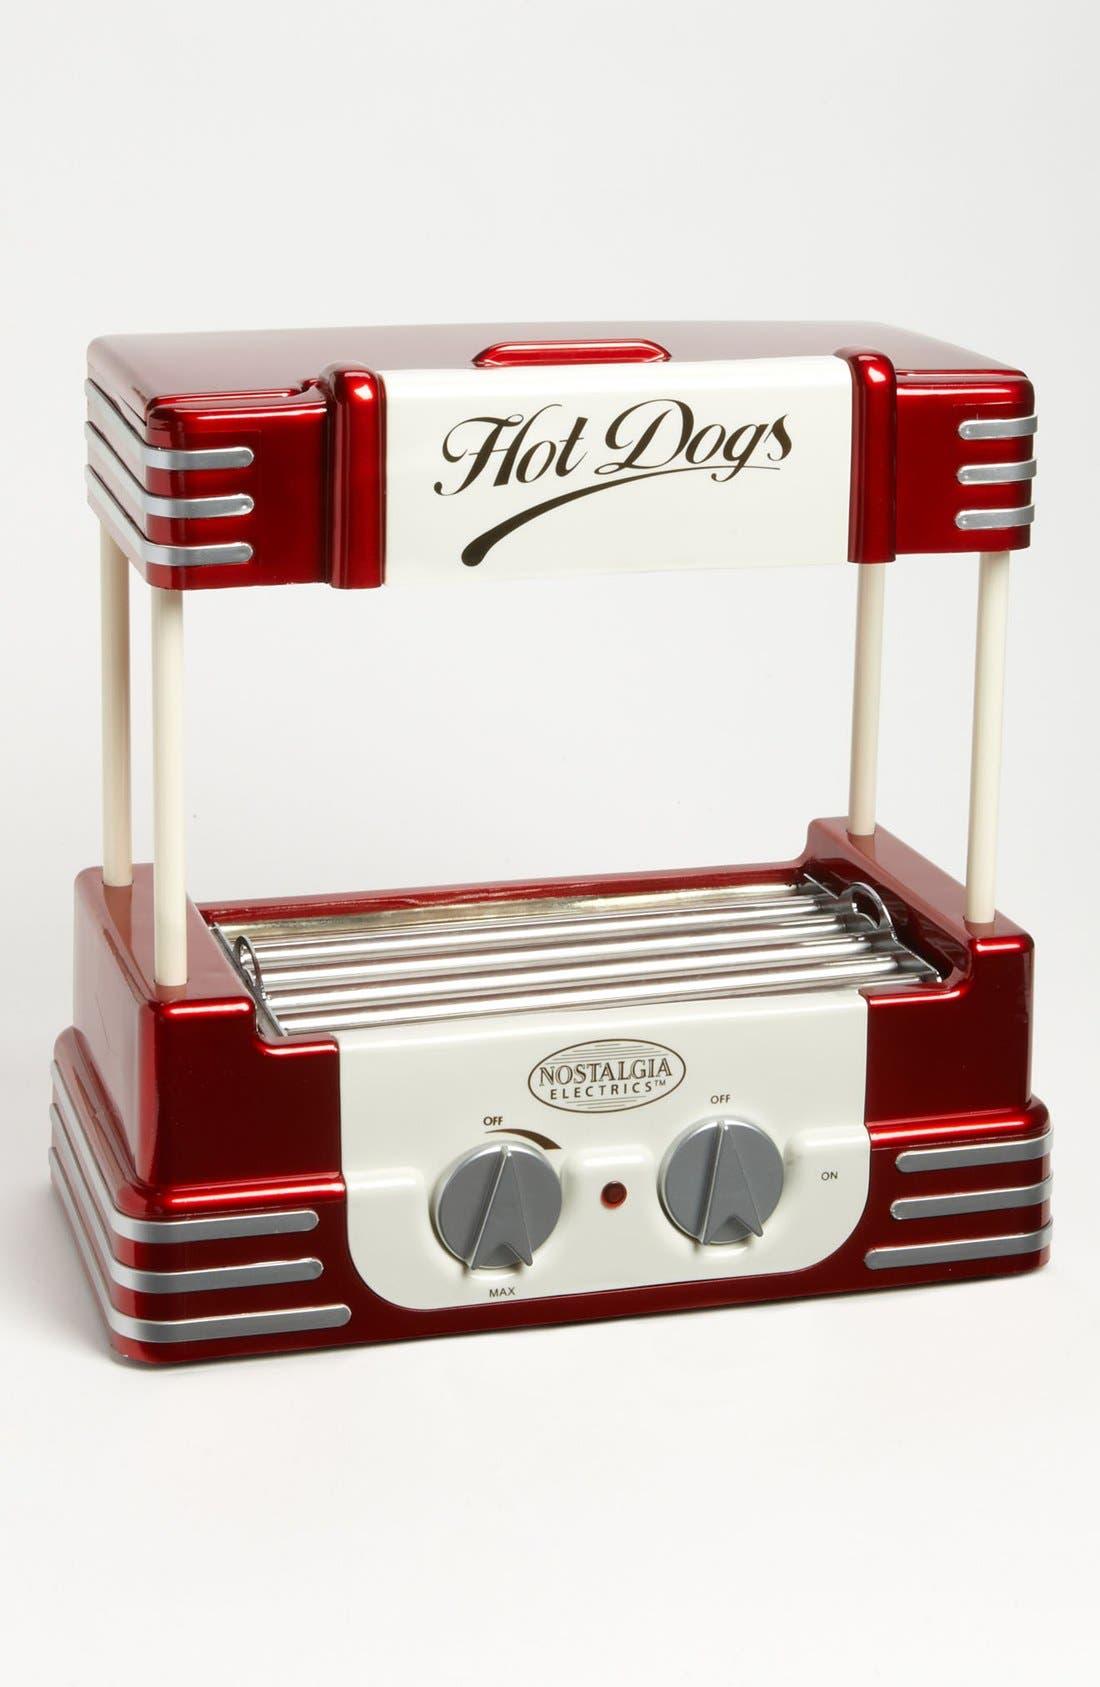 Main Image - Retro Hot Dog Roller